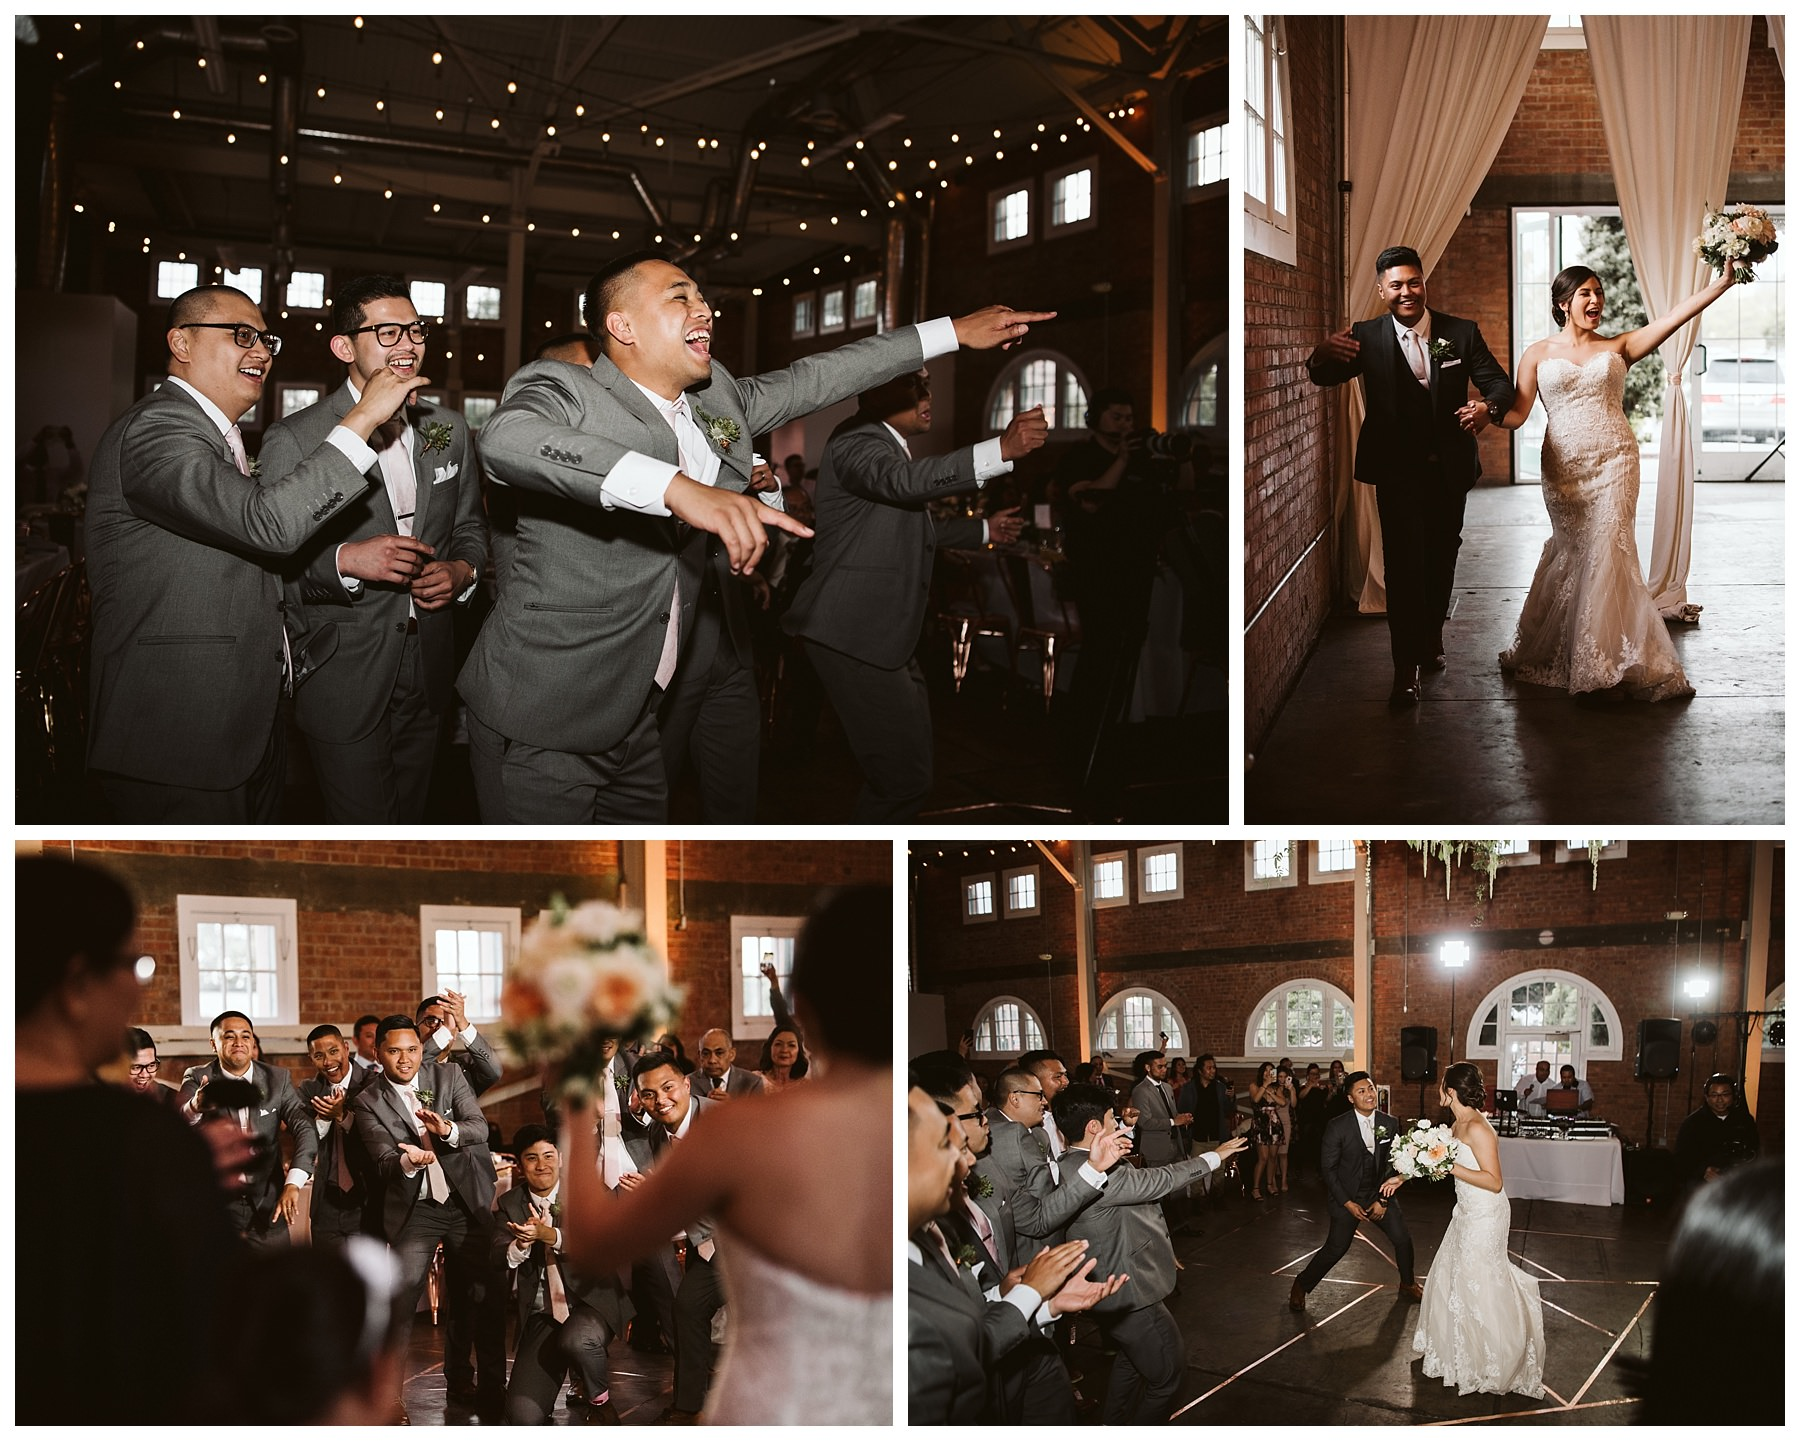 Brick_San_Diego_wedding_0052.jpg